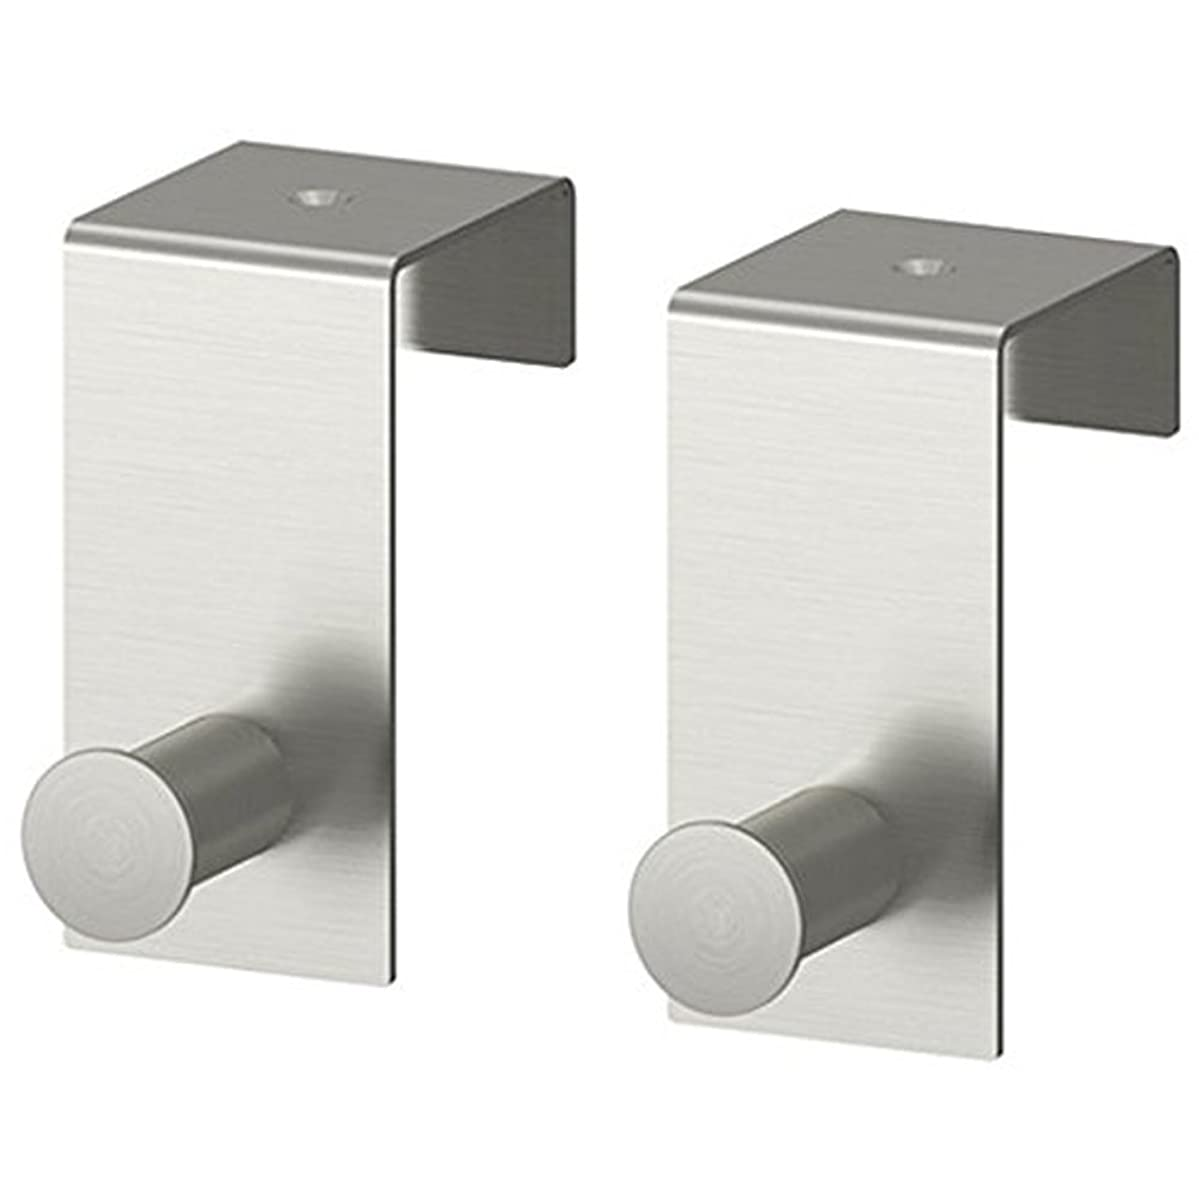 KES Stainless Steel Over-the-Door Hook 43mm Optional Screw Mount, 2 Pieces or 1 Pair